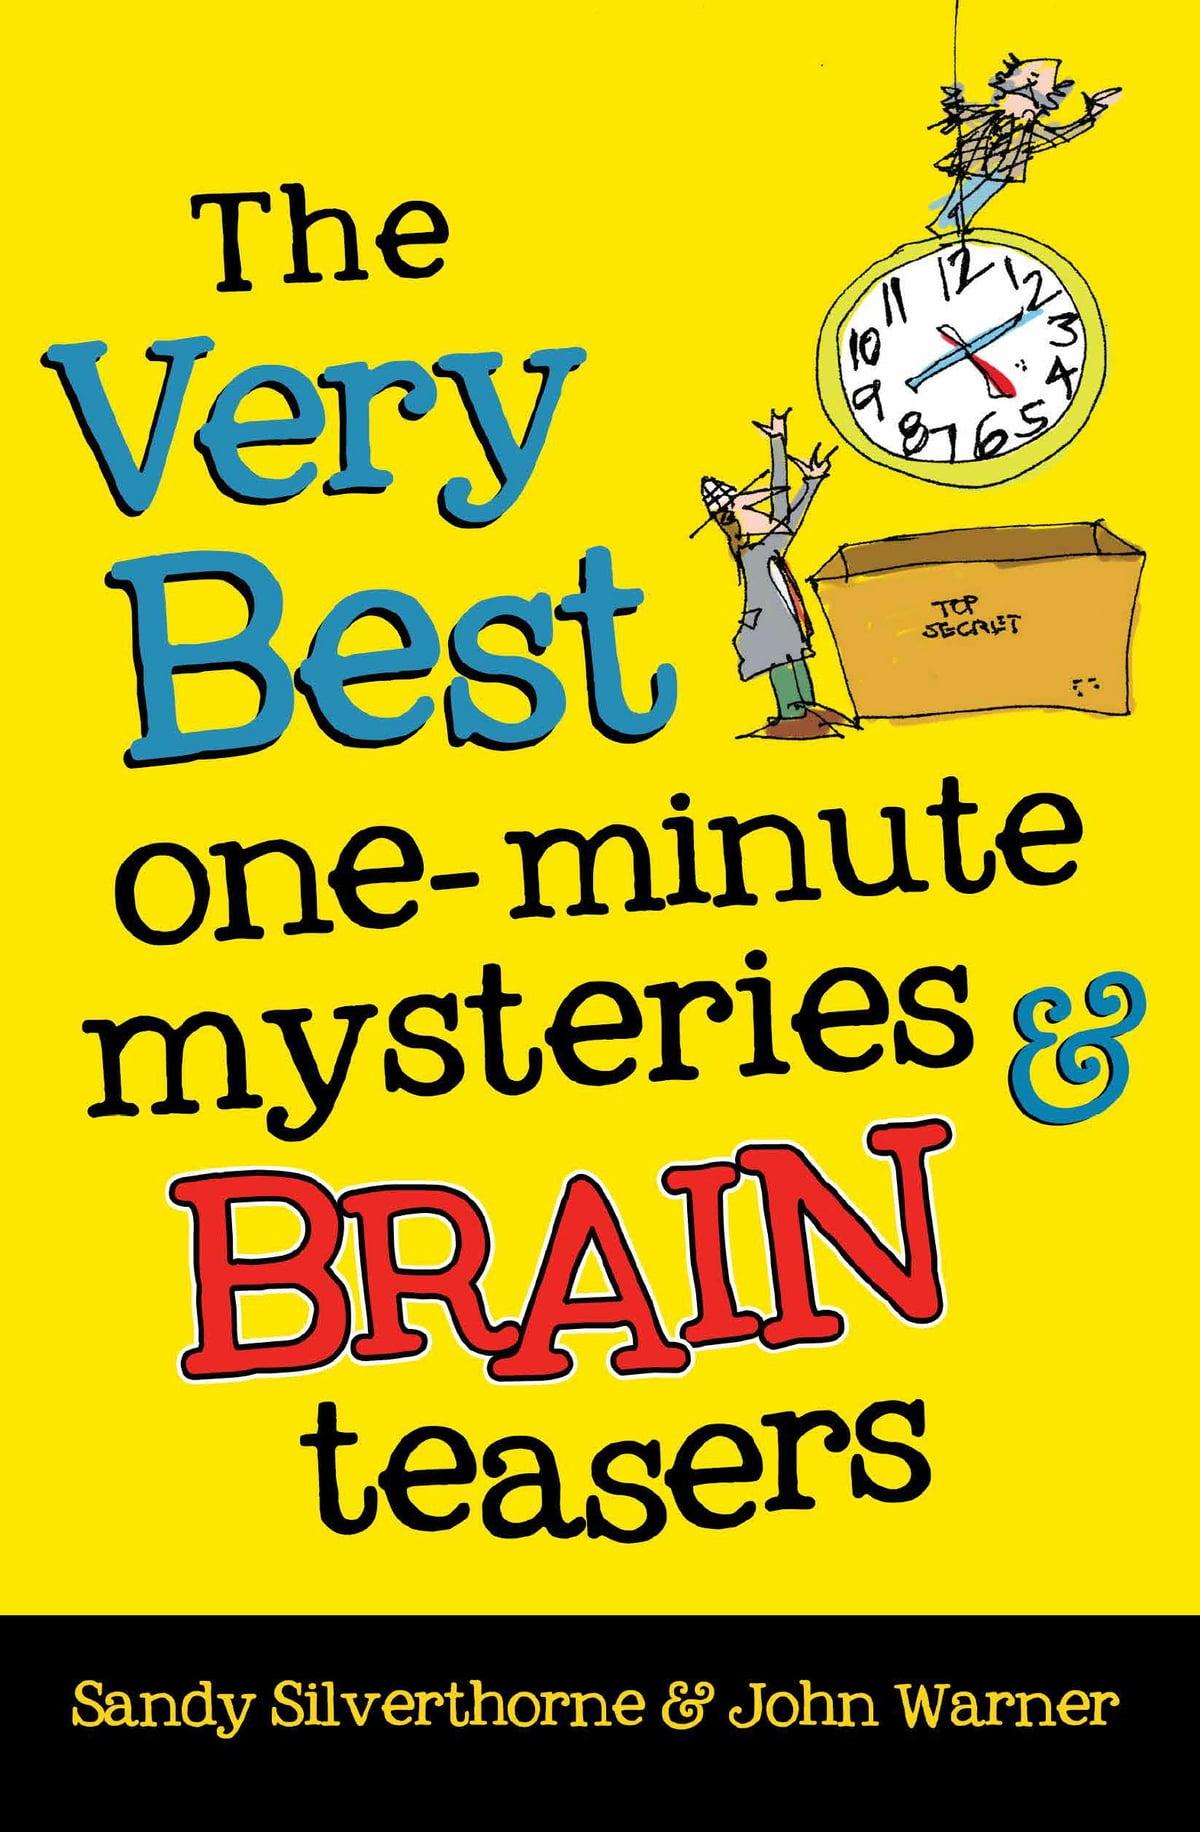 The Very Best One-Minute Mysteries and Brain Teasers eBook by Sandy Silverthorne - 9780736974318   Rakuten Kobo